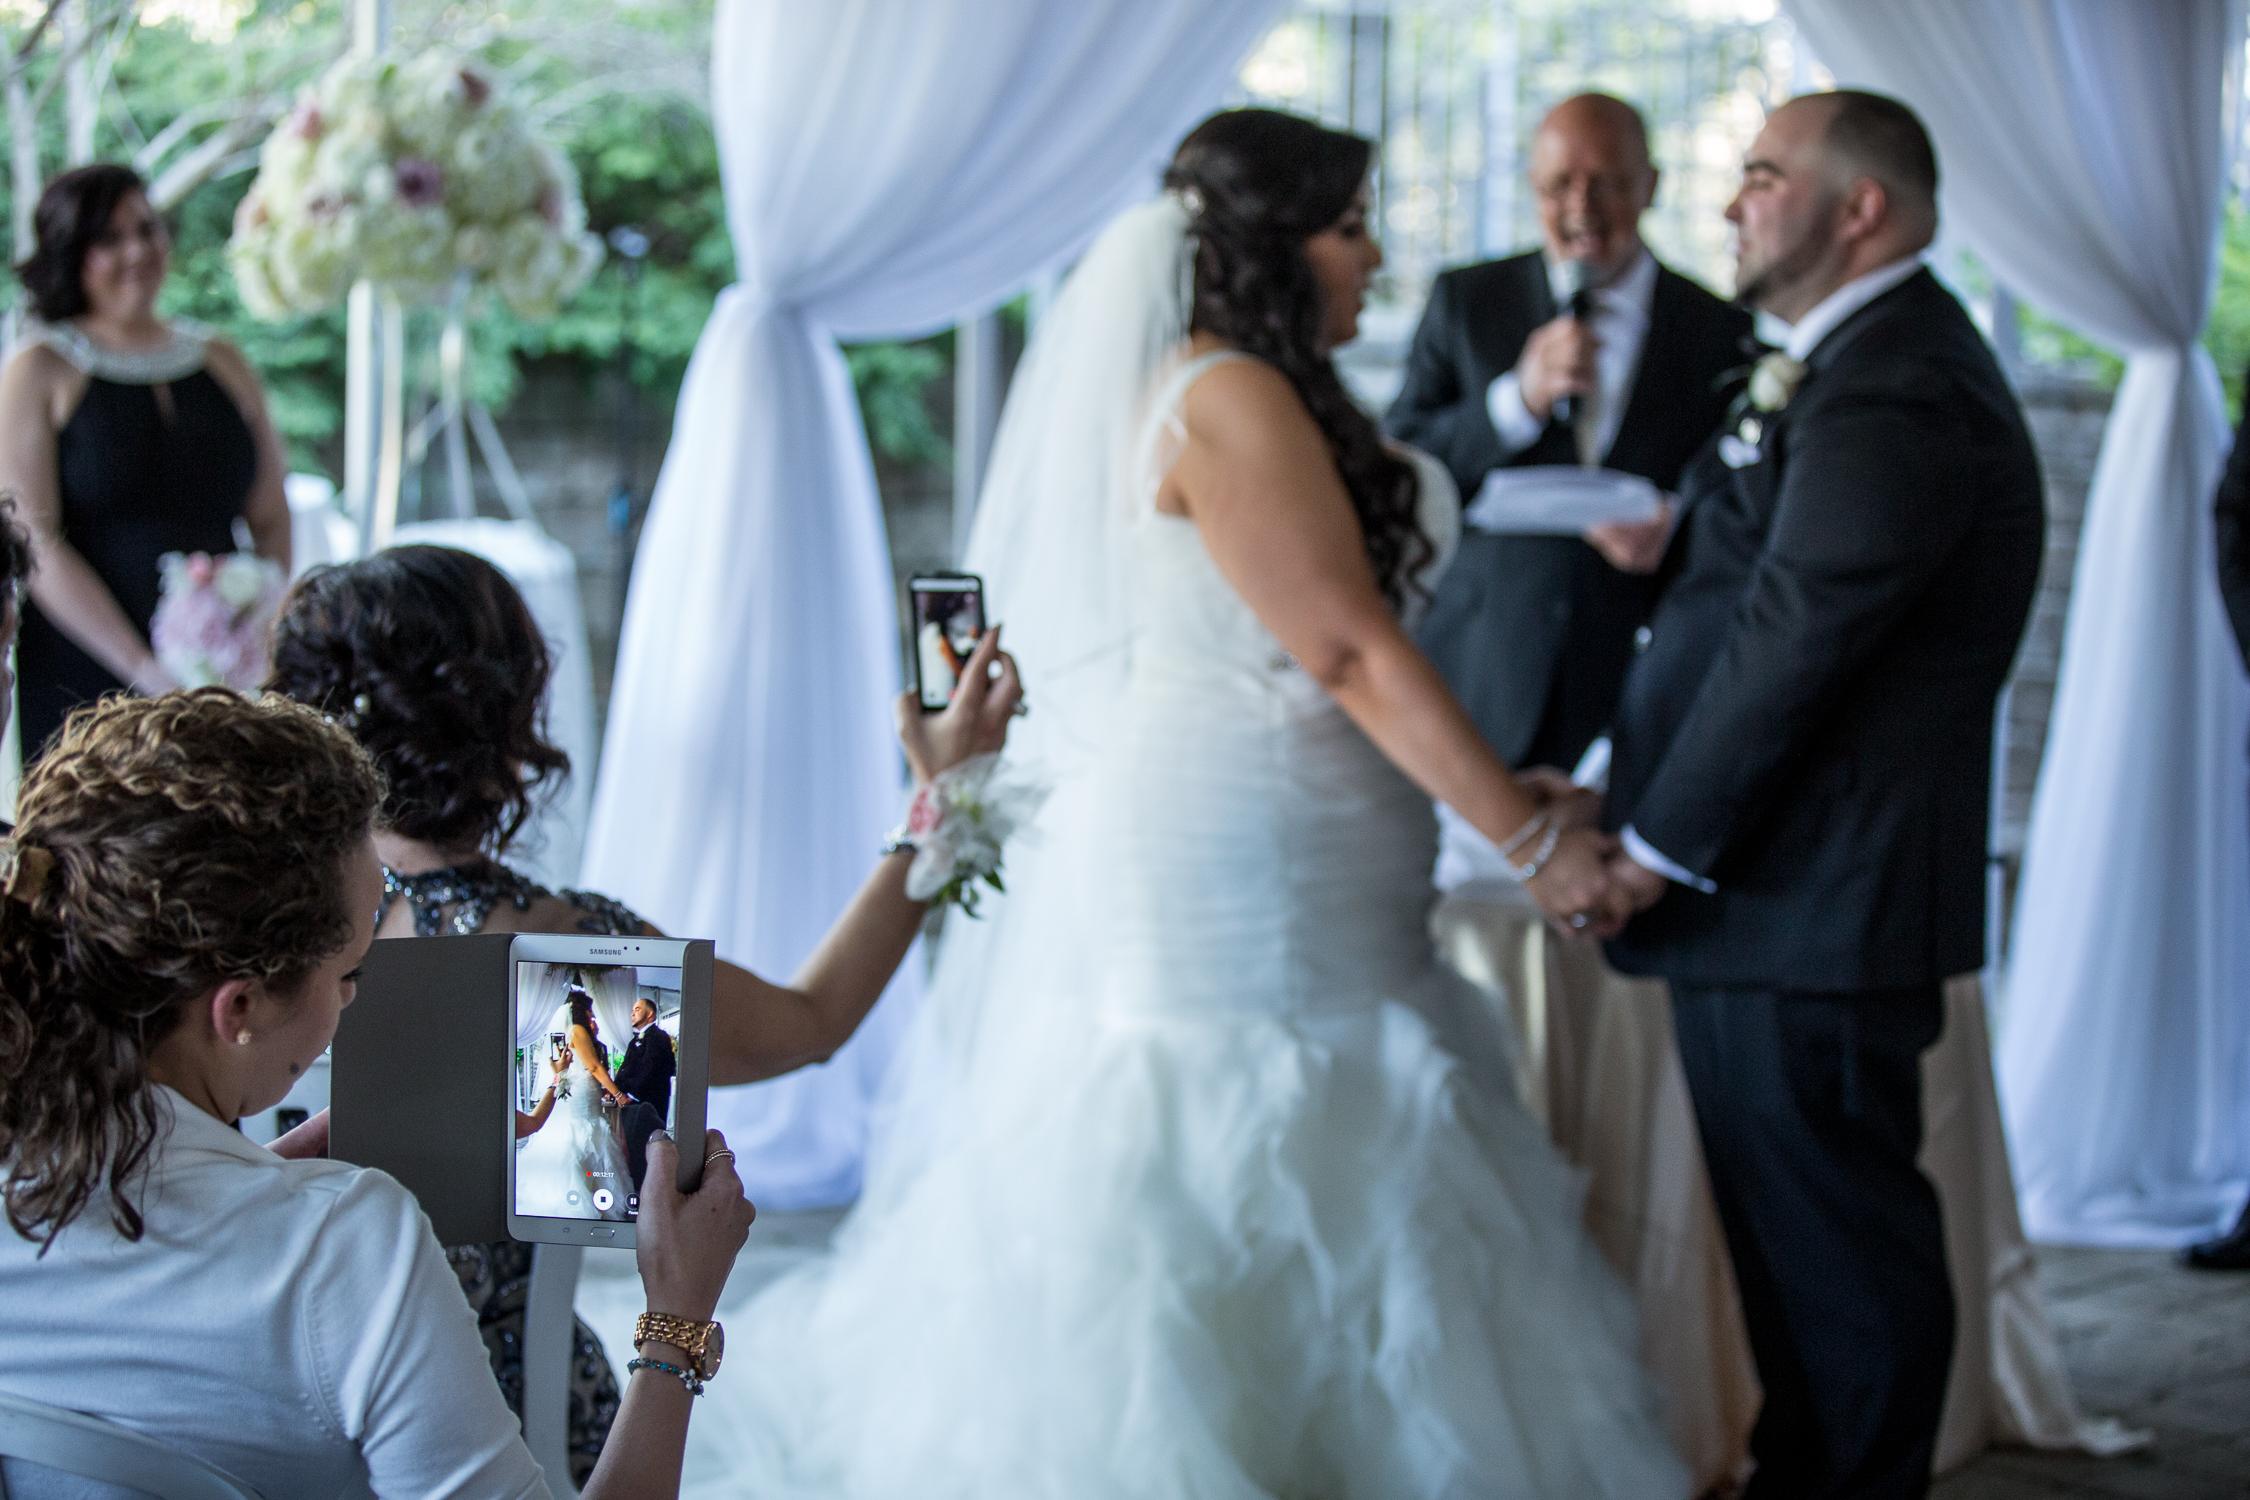 Peter-and-Marie-Wedding-Fontana-Primavera-Graydon-Hall-Manor-Toronto-Ontario-Canada-0038.jpg